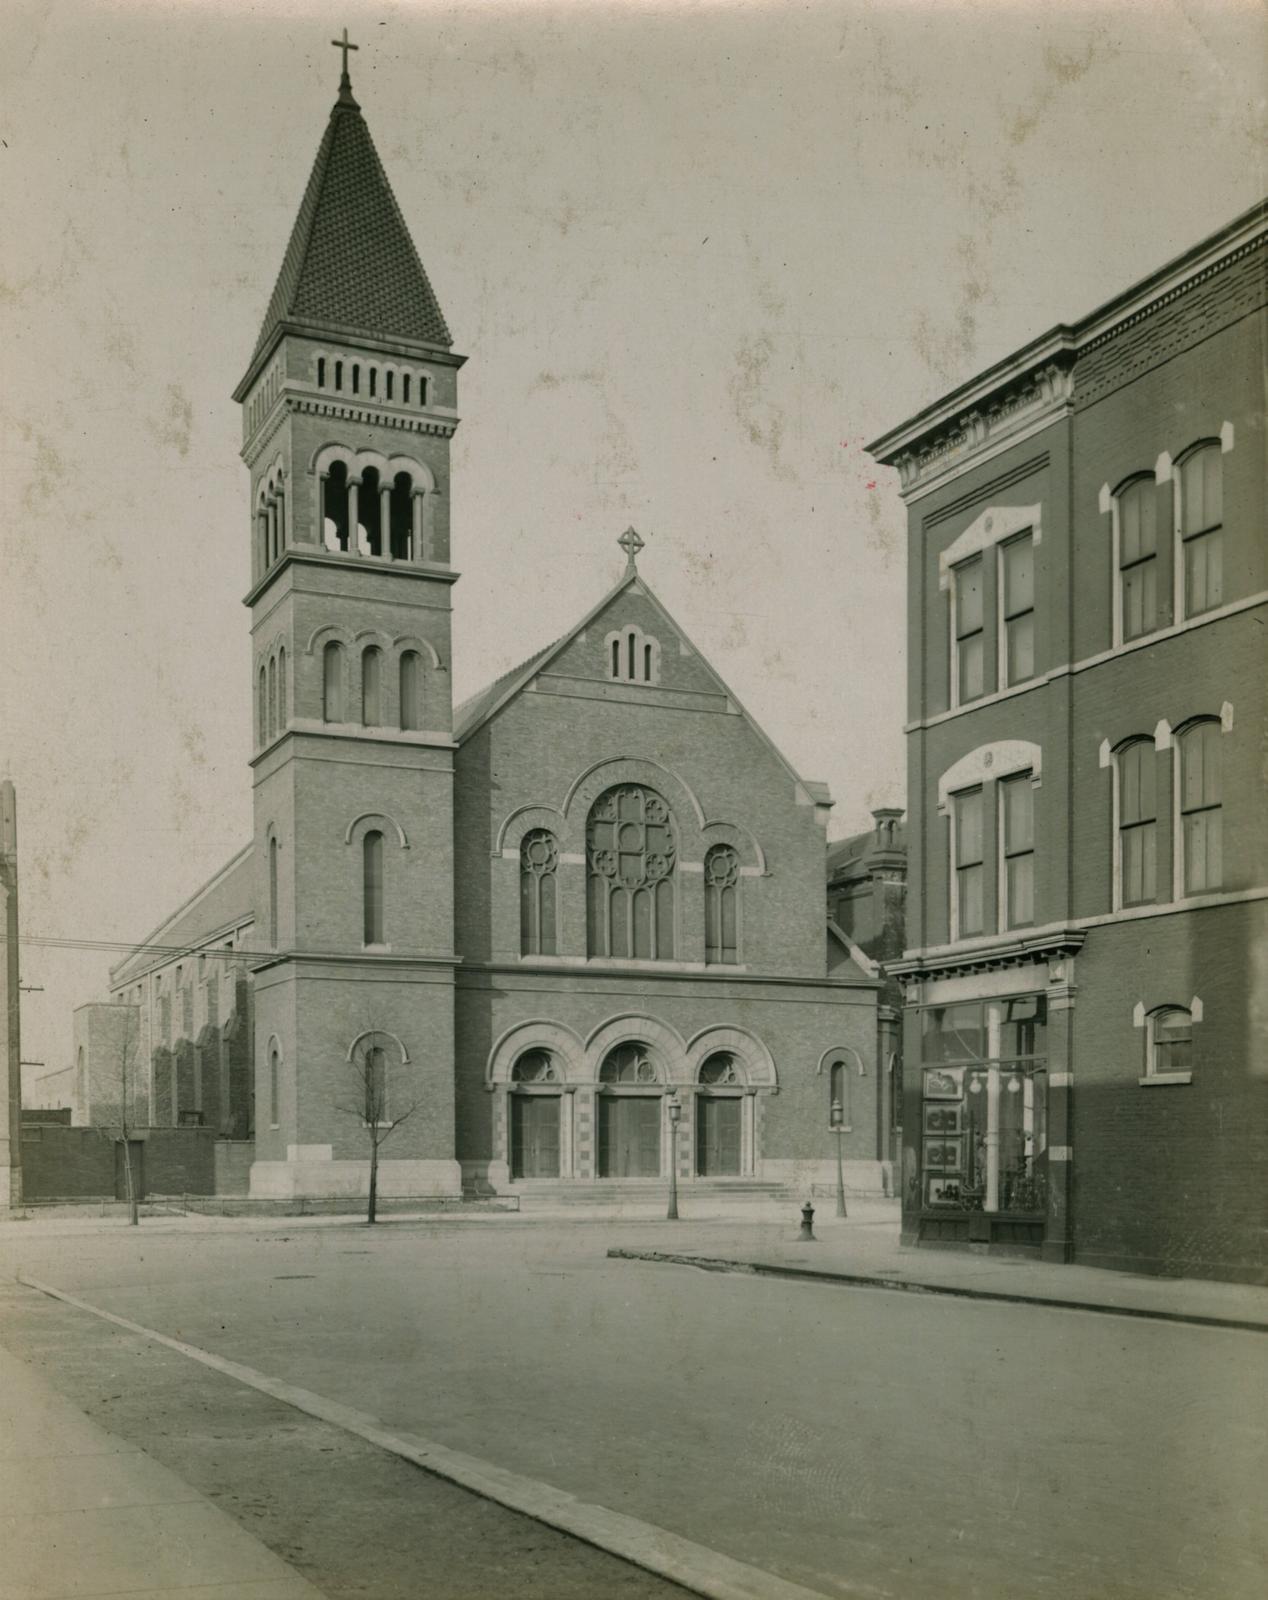 Saint Bridget's Catholic Church, Chicago, 1913